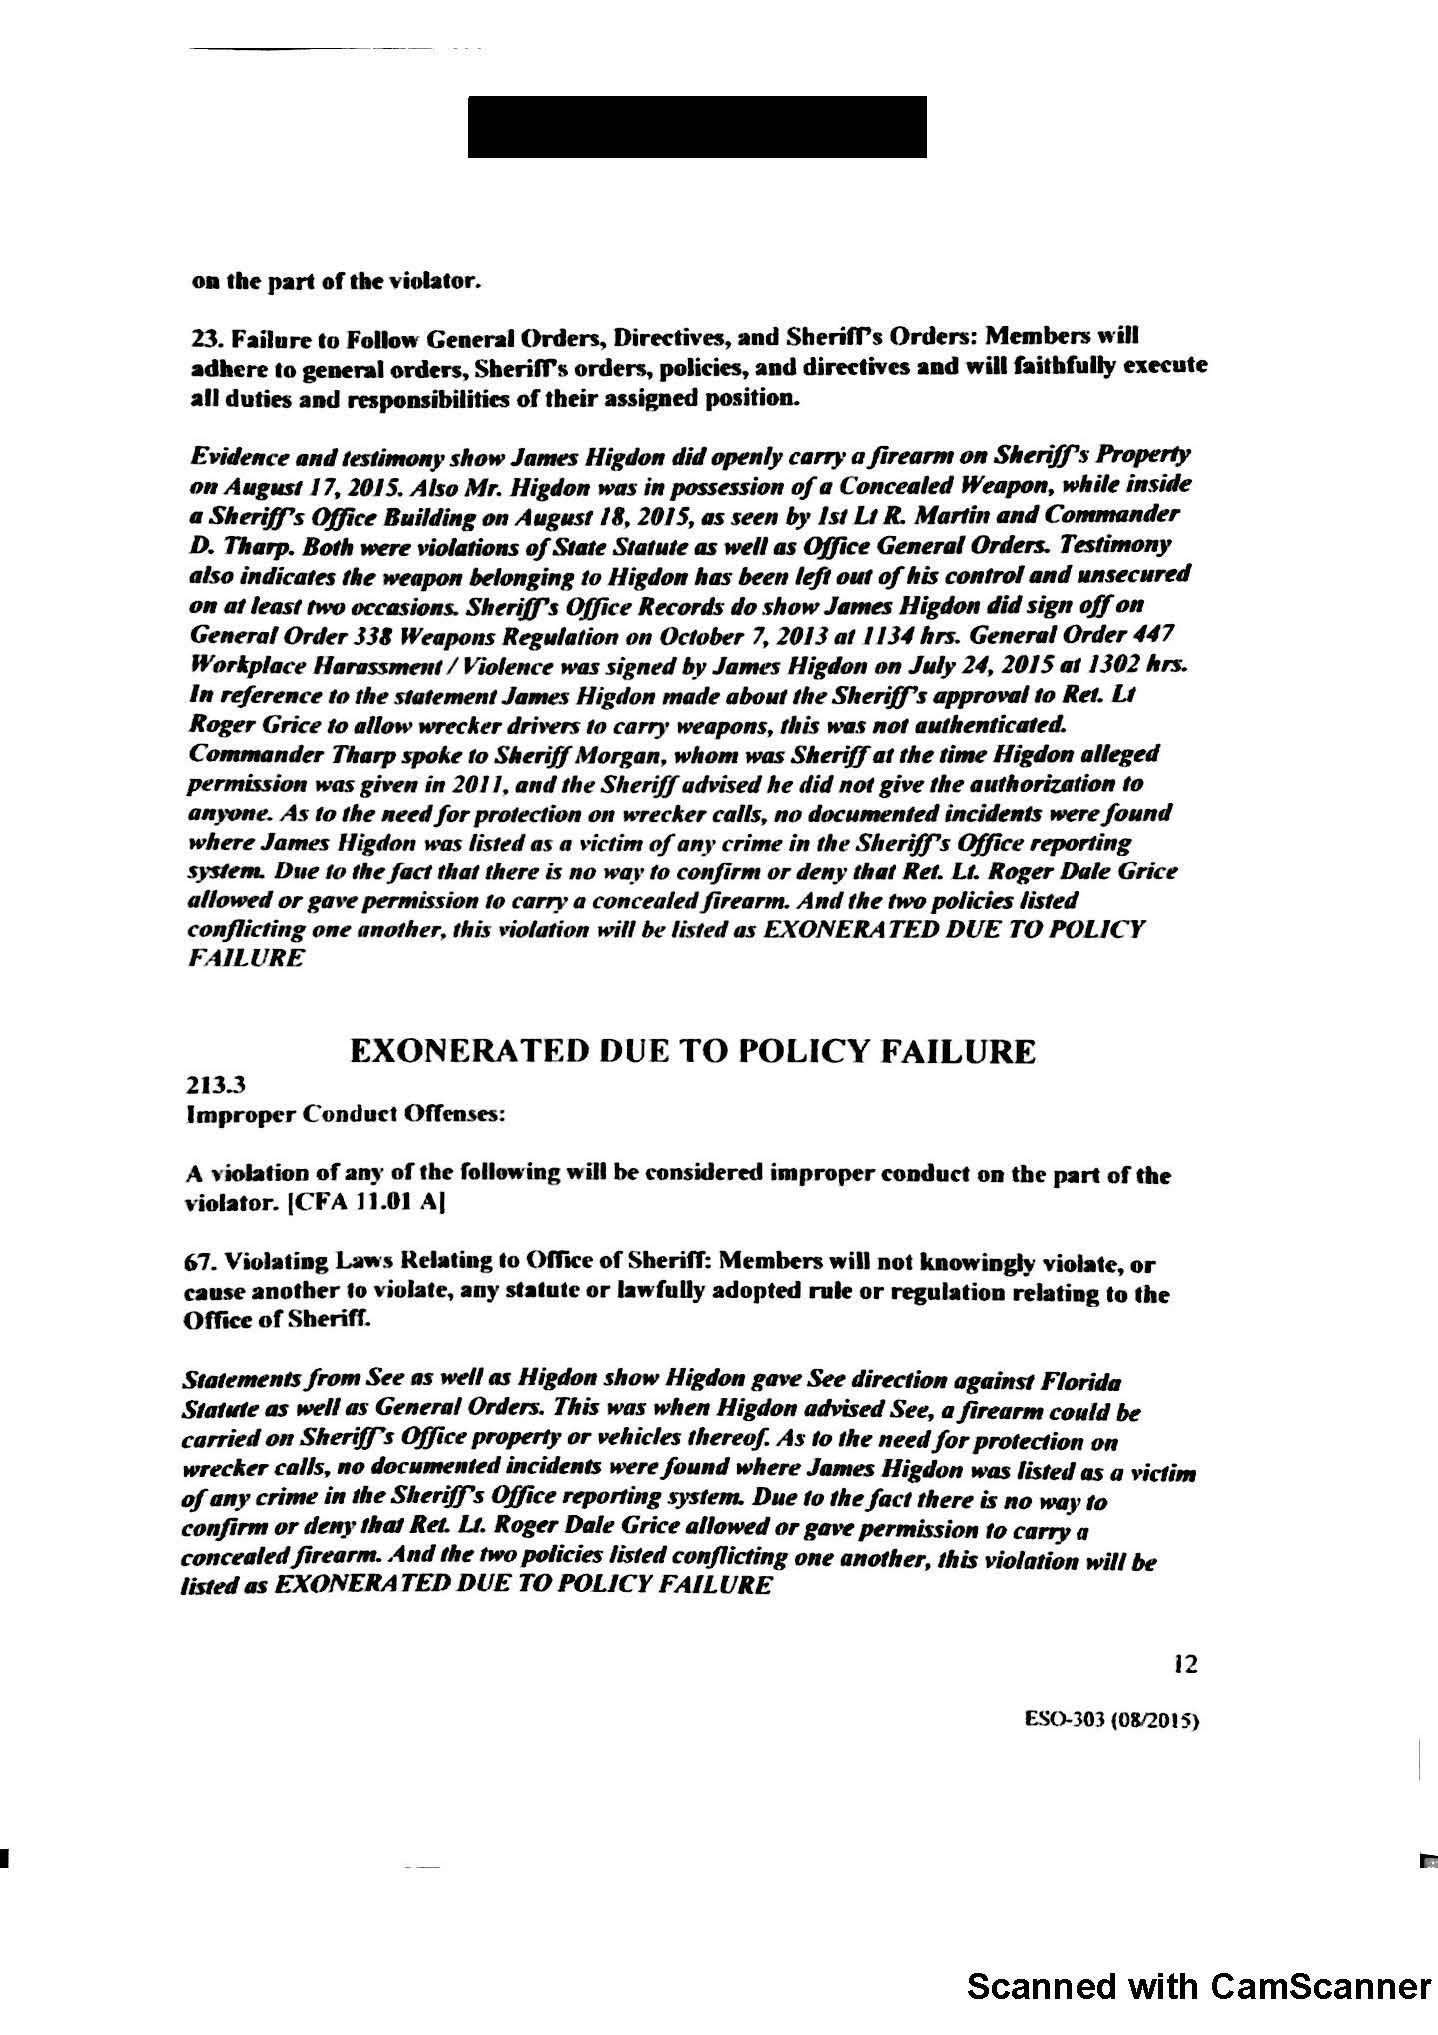 higdon investigation_Page_12